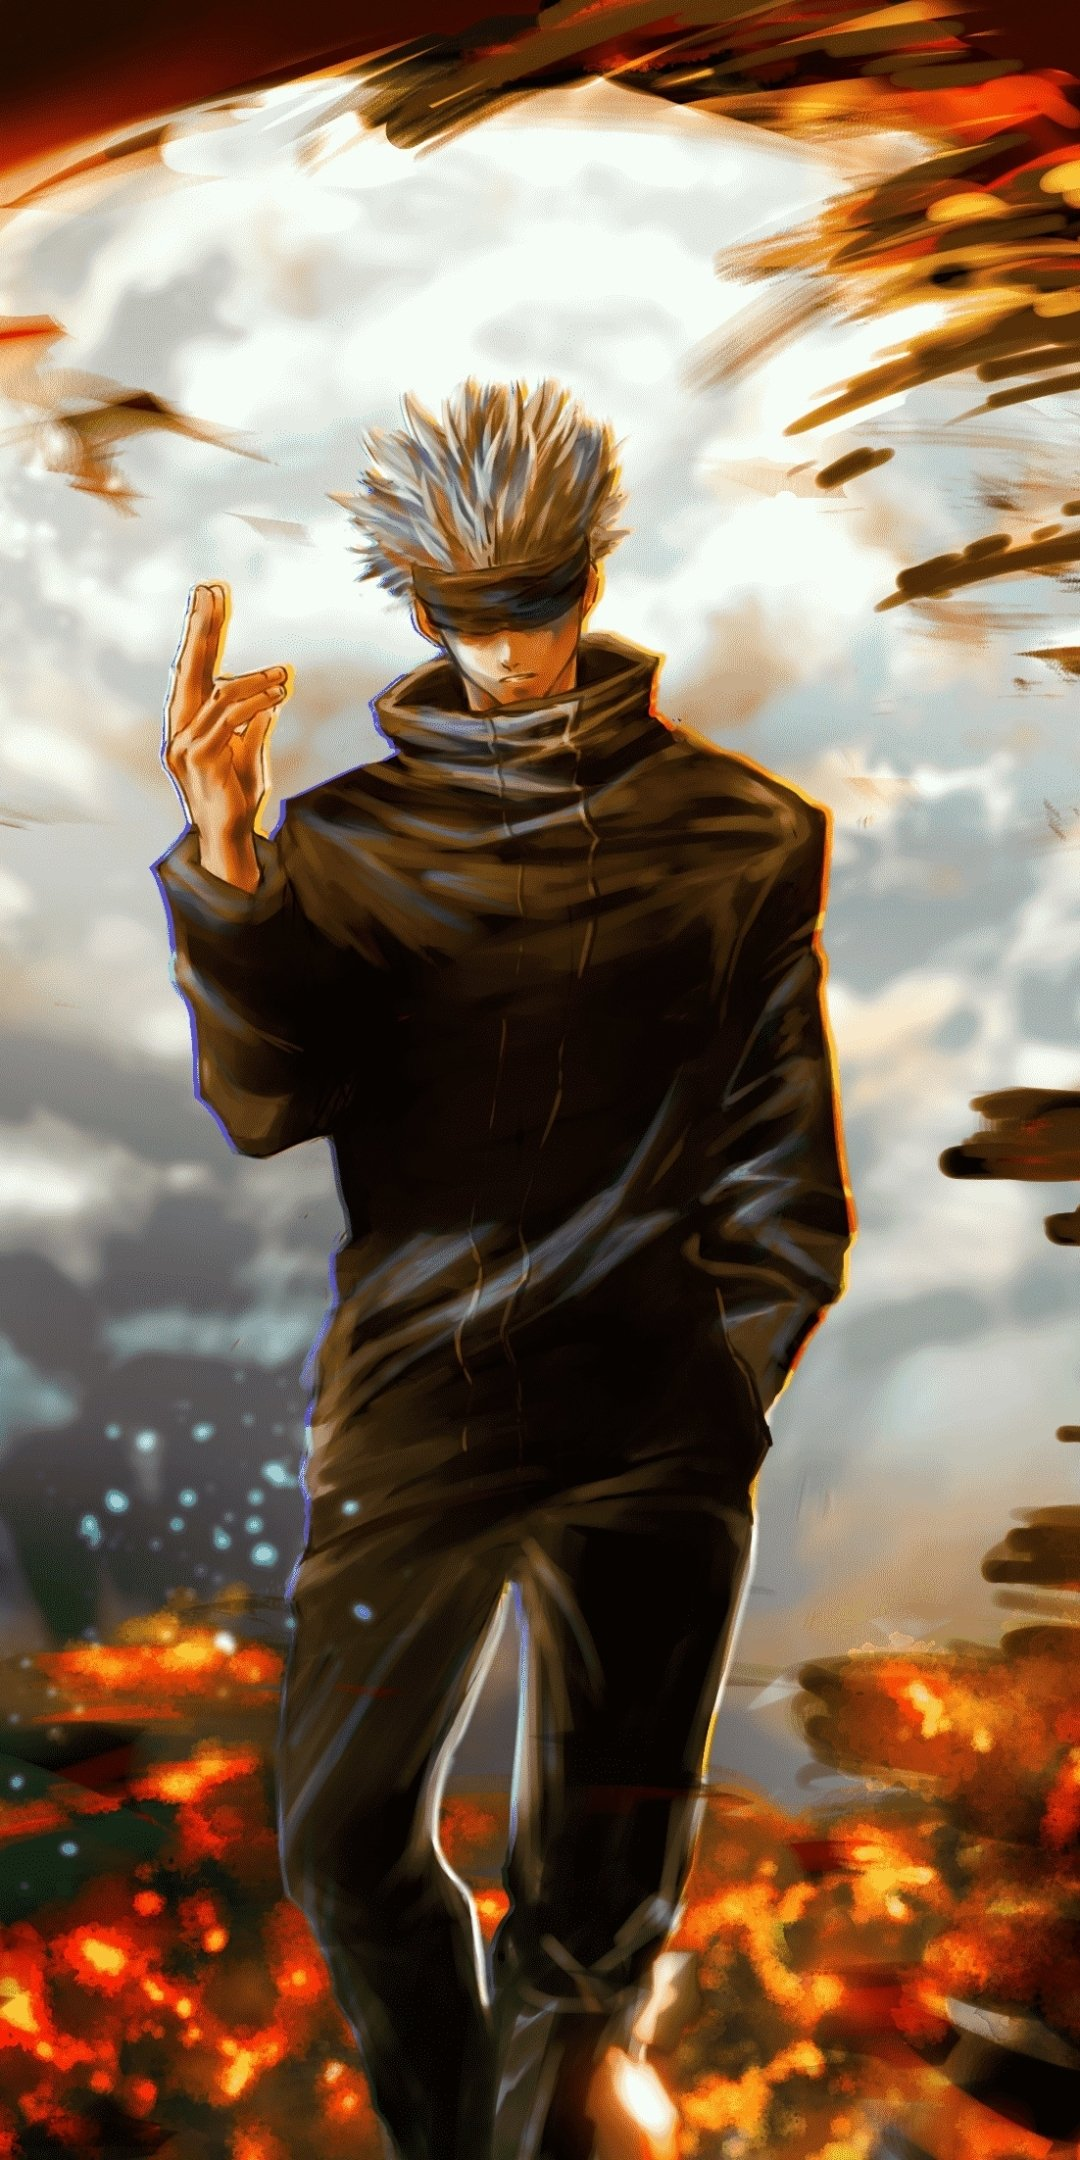 Download Wallpaper Anime / Jujutsu Kaisen (1080x2160) Mobile Wallpaper